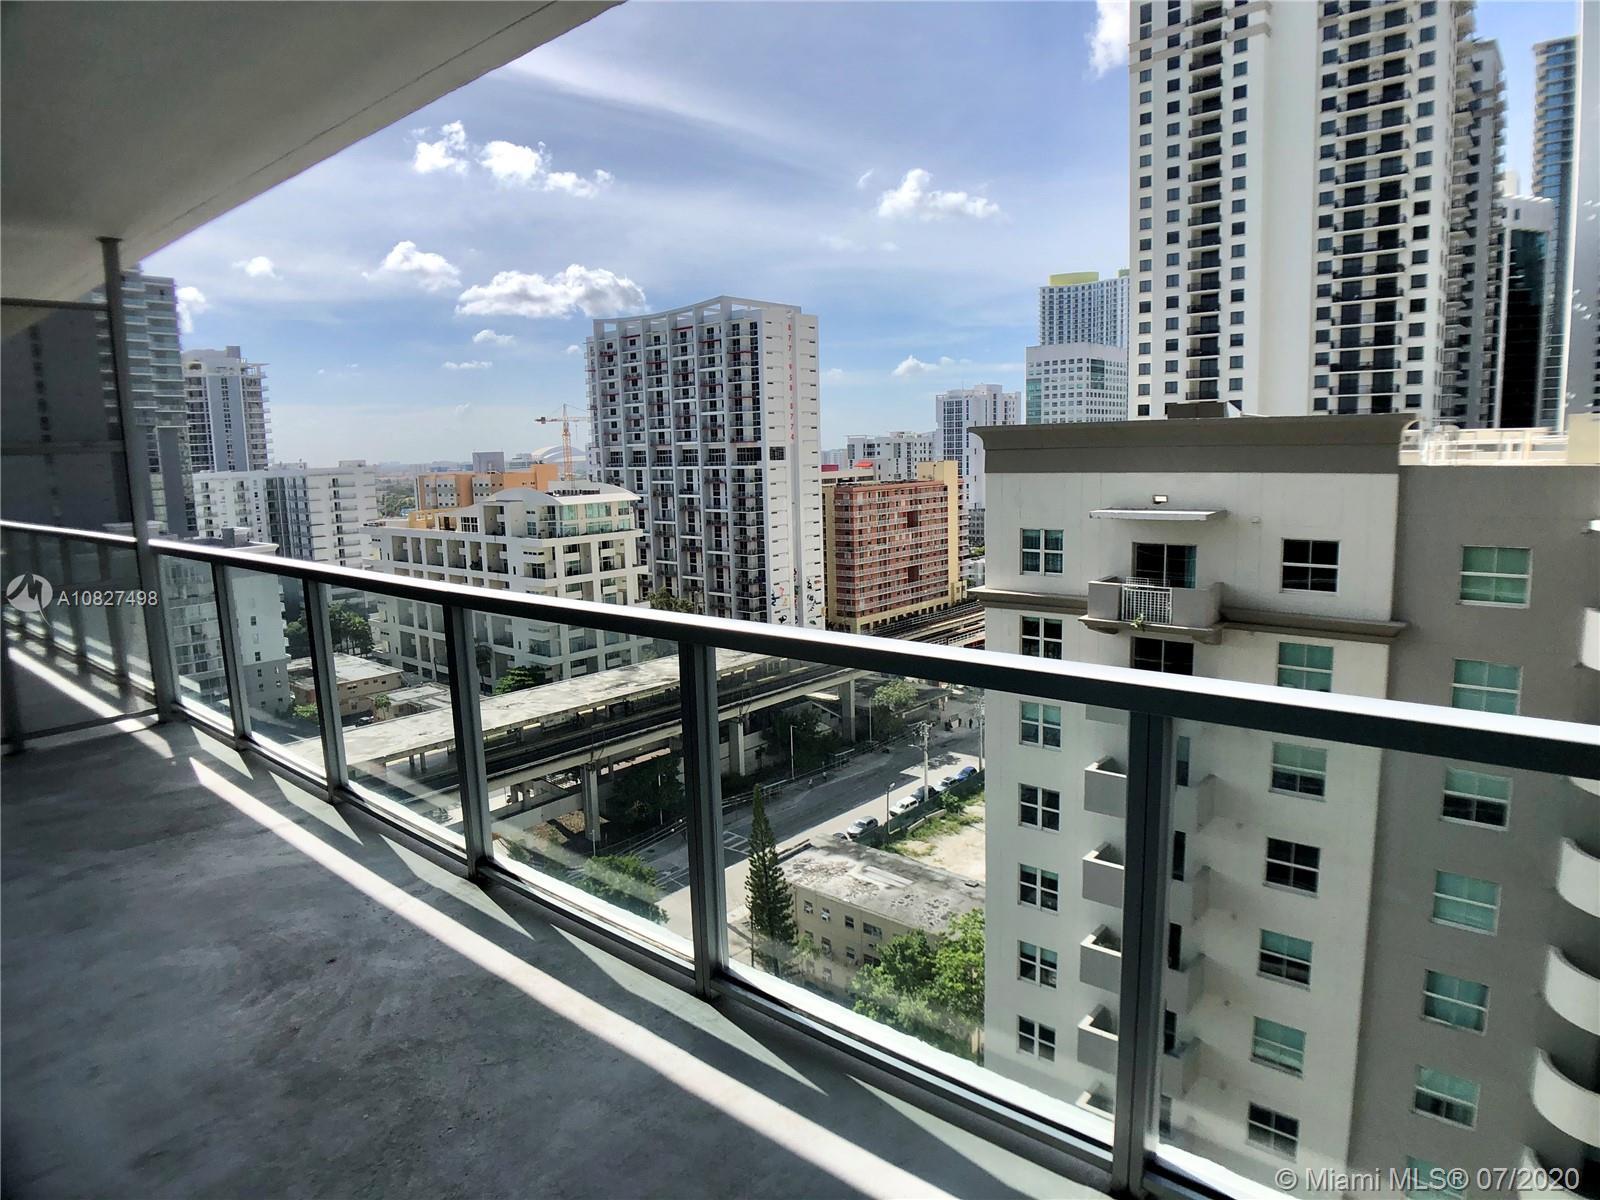 Axis on Brickell North Tower #1723-N - 1111 SW 1 AV #1723-N, Miami, FL 33130